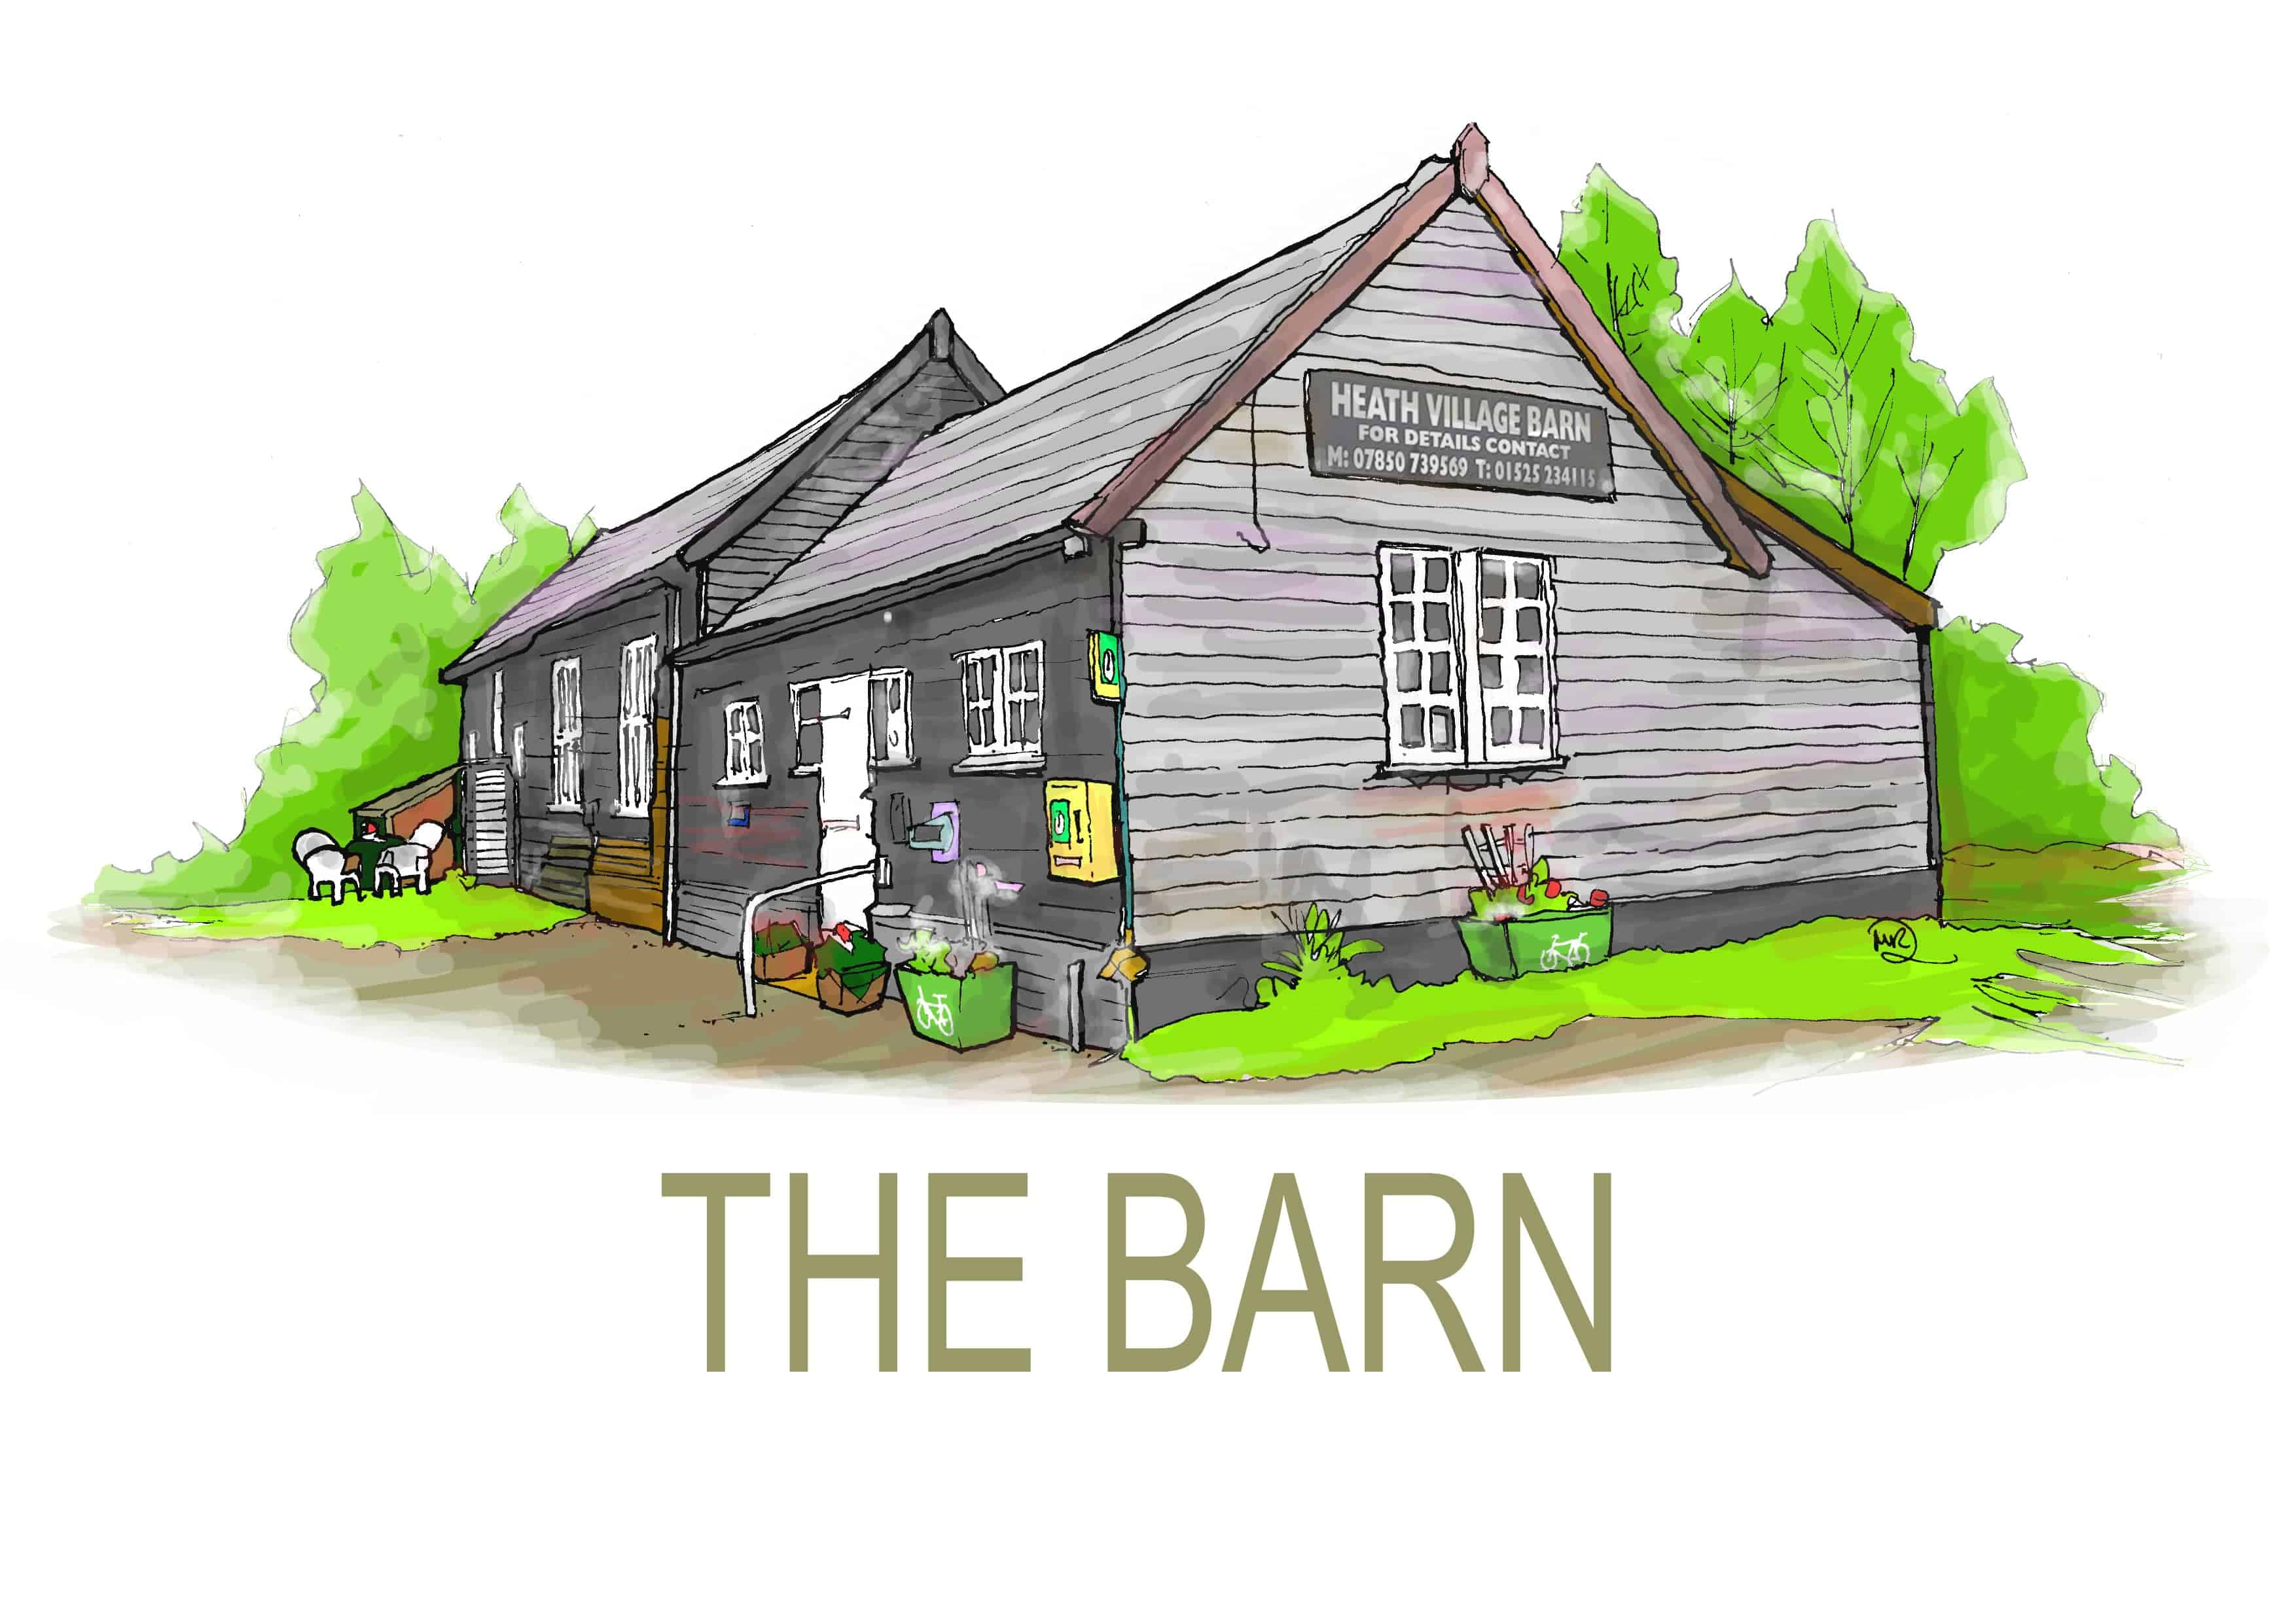 Heath Village Barn